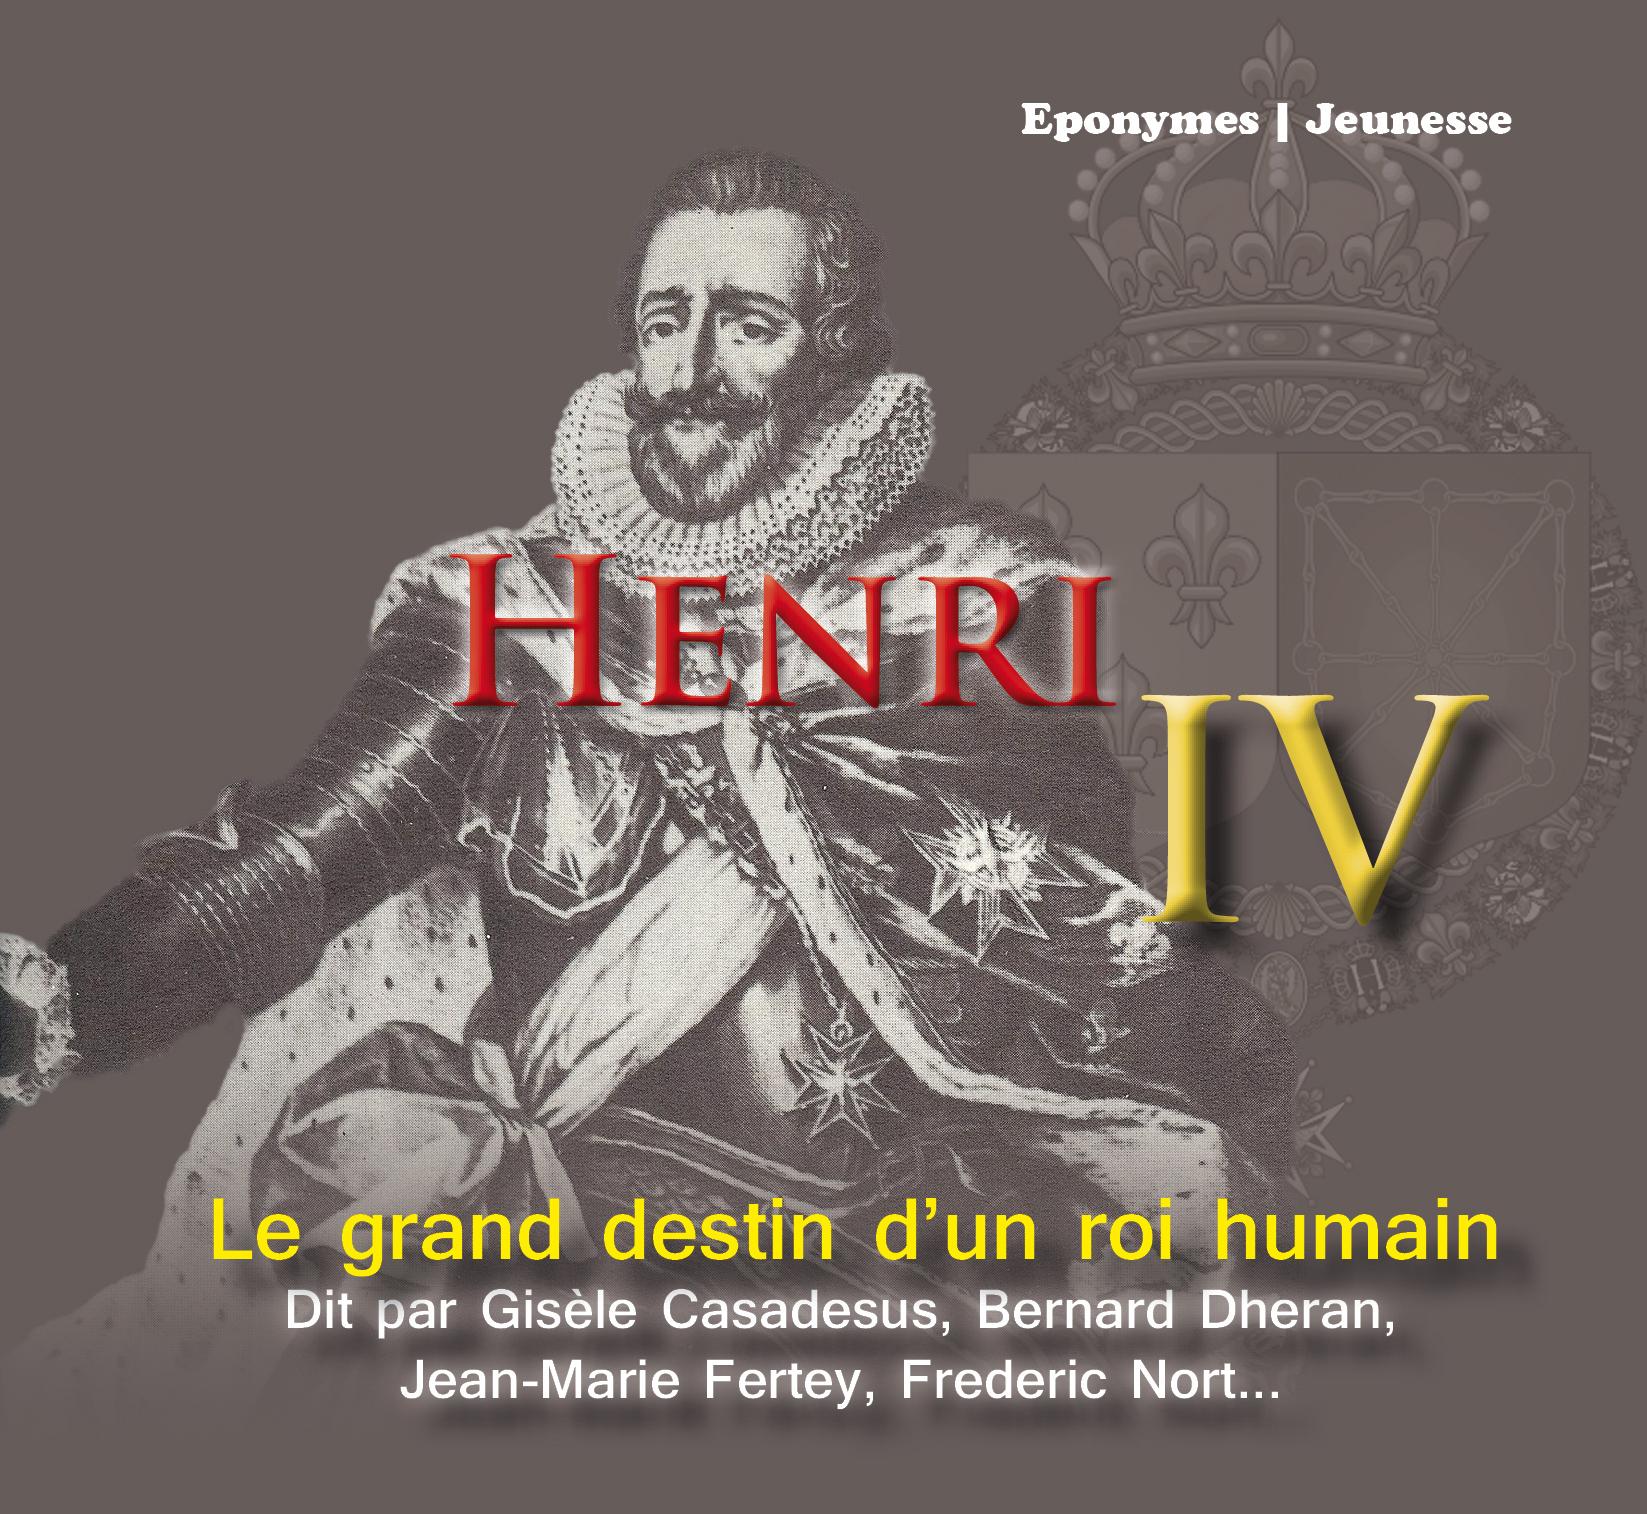 HENRI IV LE DESTIN D'UN ROI HUMAIN